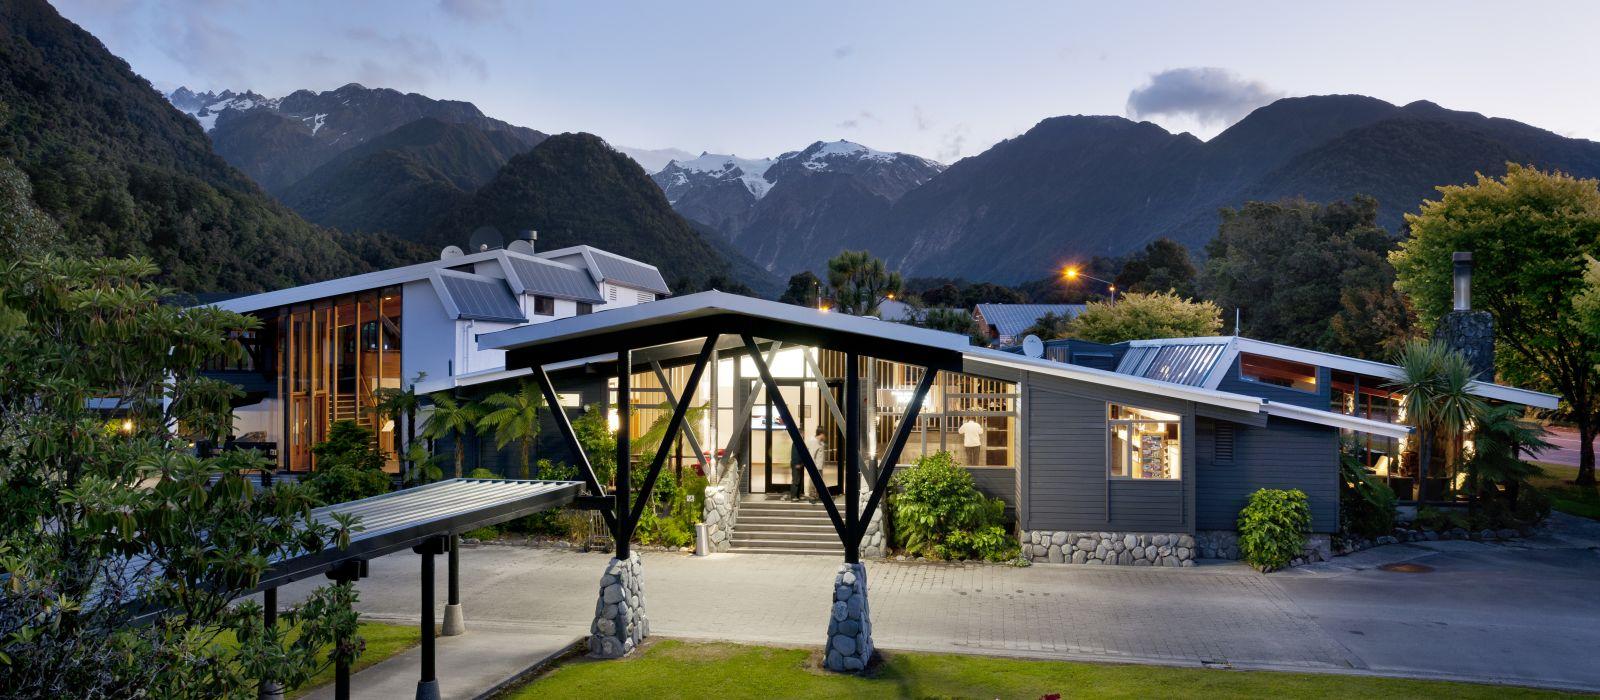 Hotel Scenic  Franz Josef Glacier New Zealand